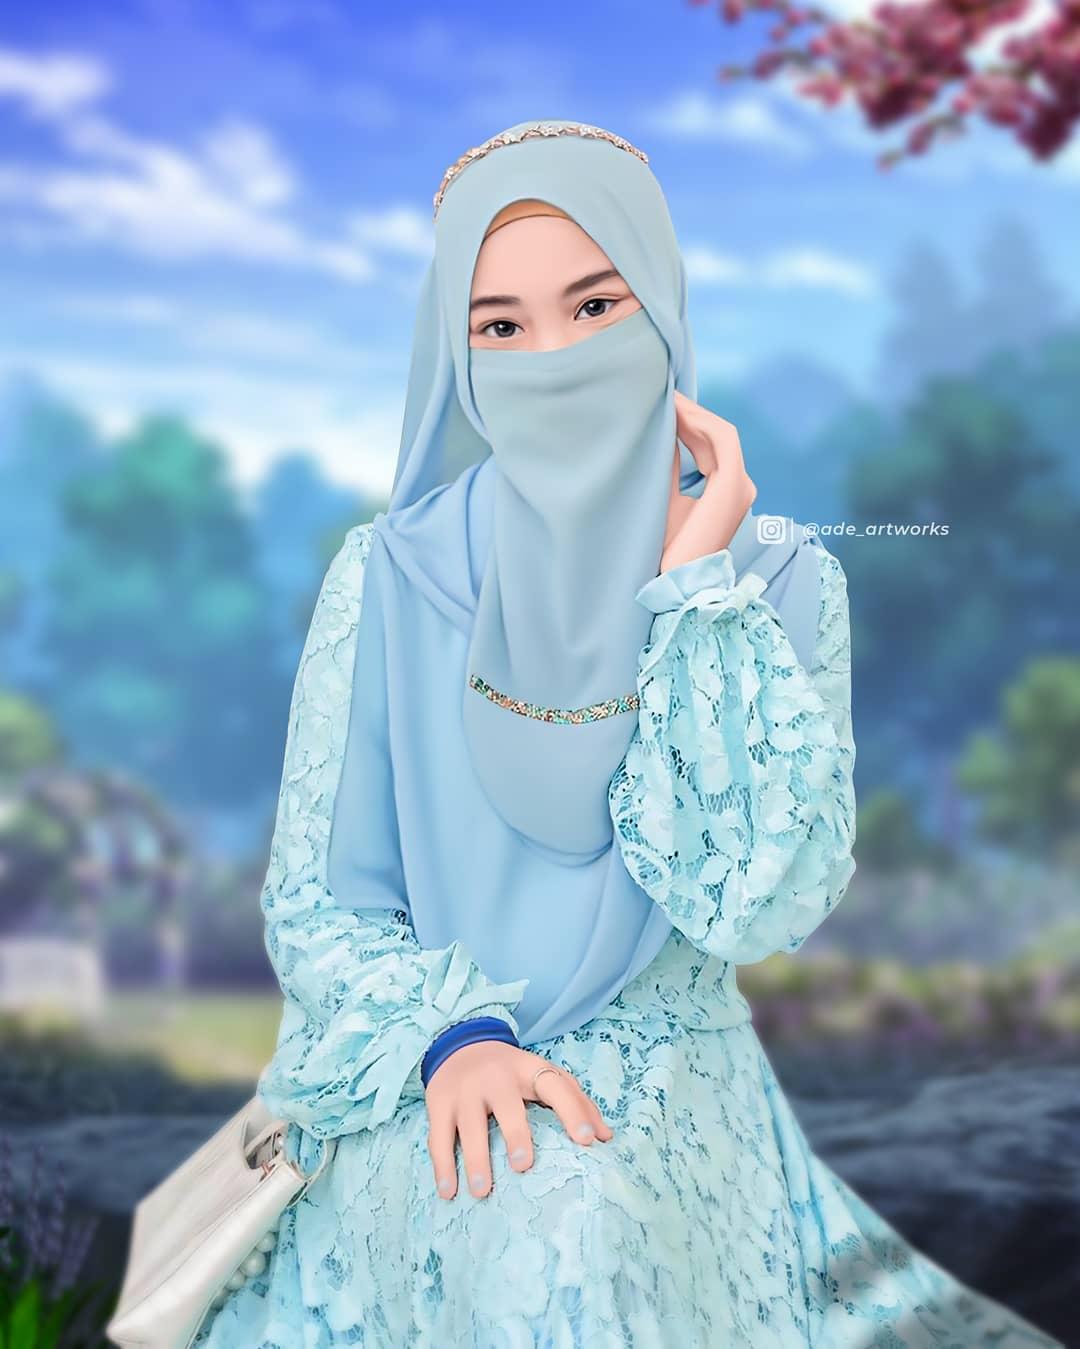 Gambar Kartun Muslimah,Muslimah Cadar,Kartun Muslimah,gambar kartun muslimah,islamic pattern vector,islamic background vector,download vector islamic mosque free,islamic vector png,